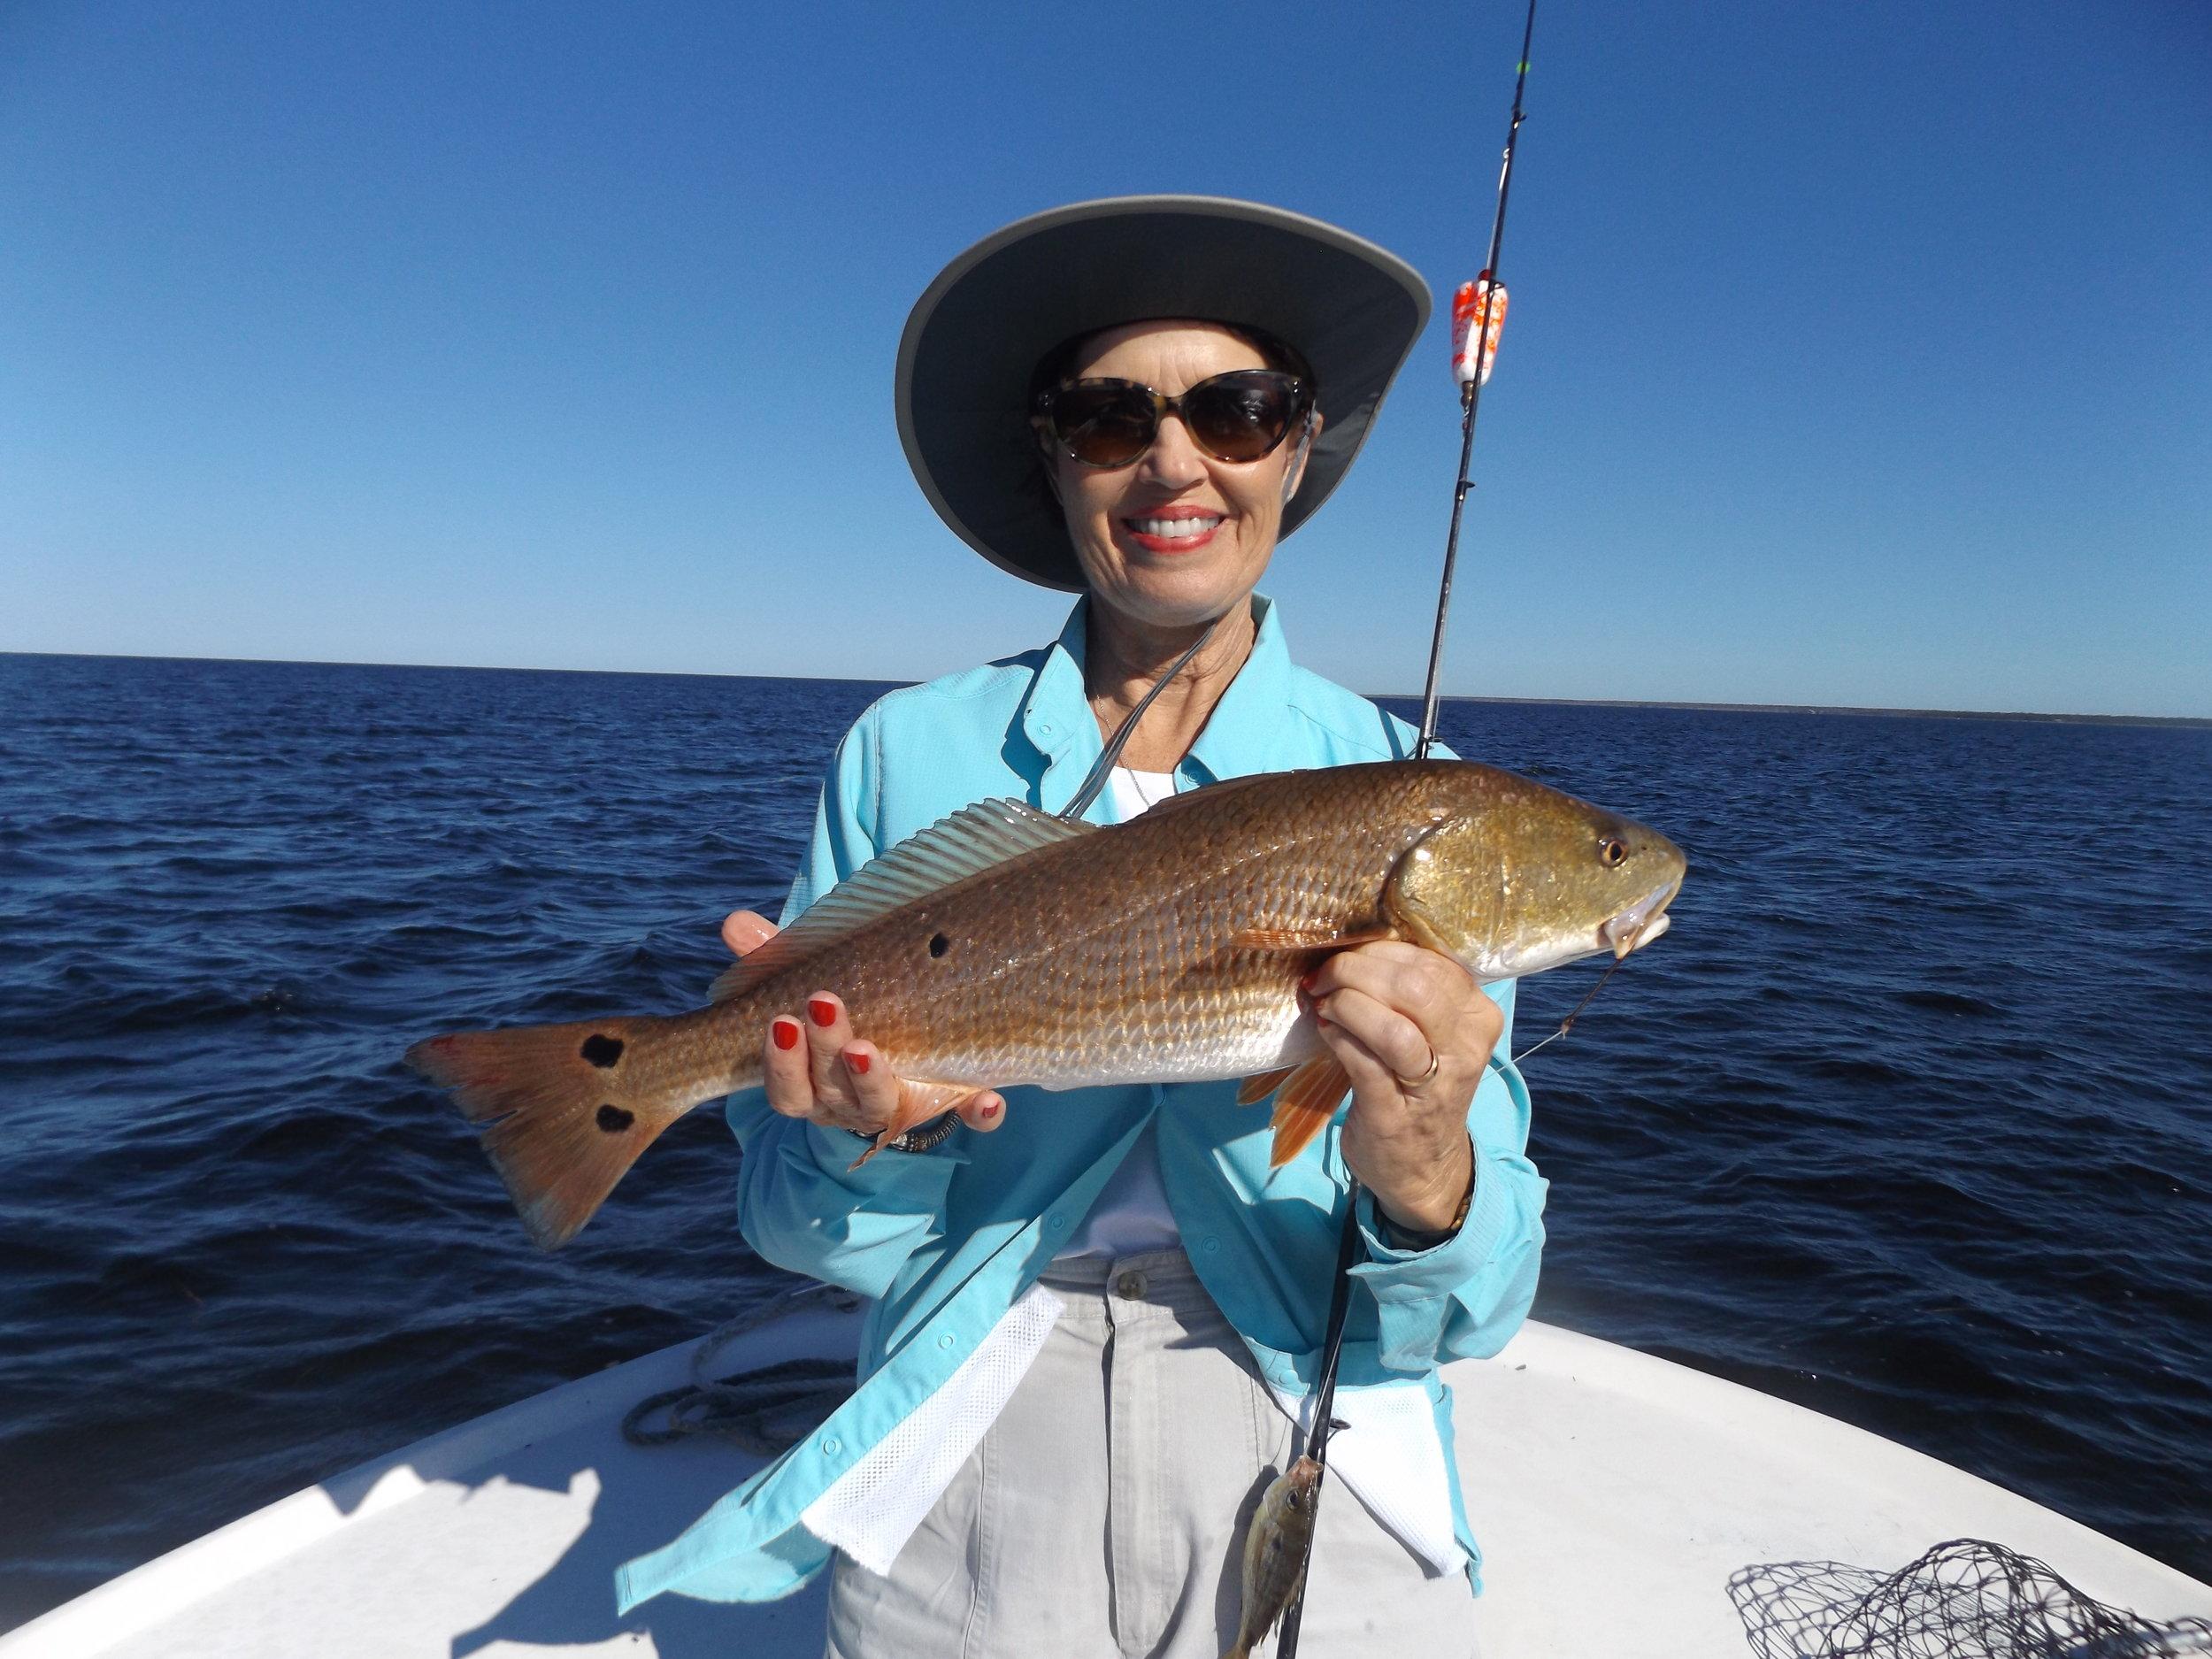 jean Seago of Valdosta, Ga with a grand redfish